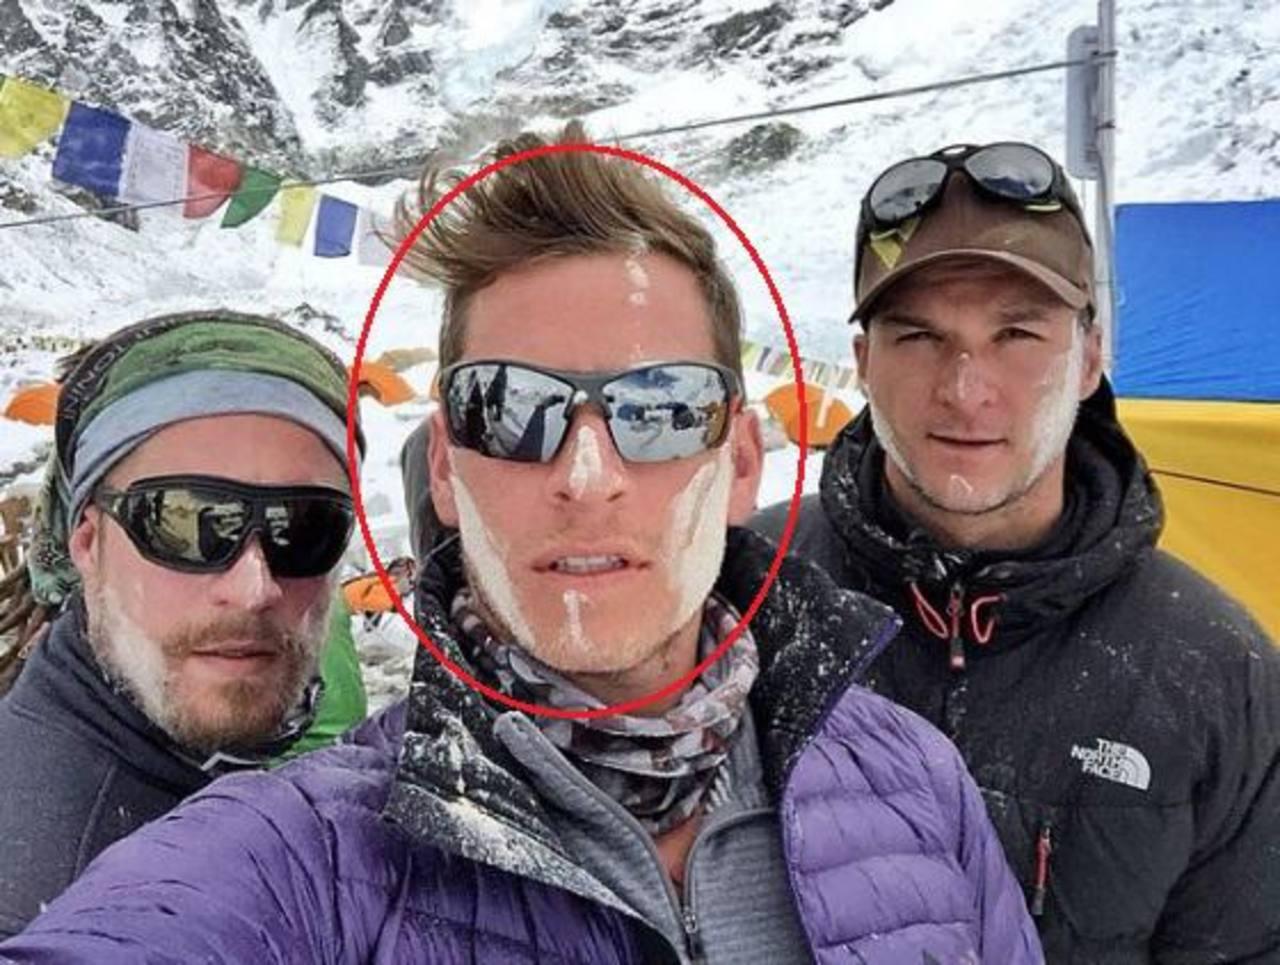 ¿Quién era el ejecutivo de Google que murió en una avalancha en el Everest?